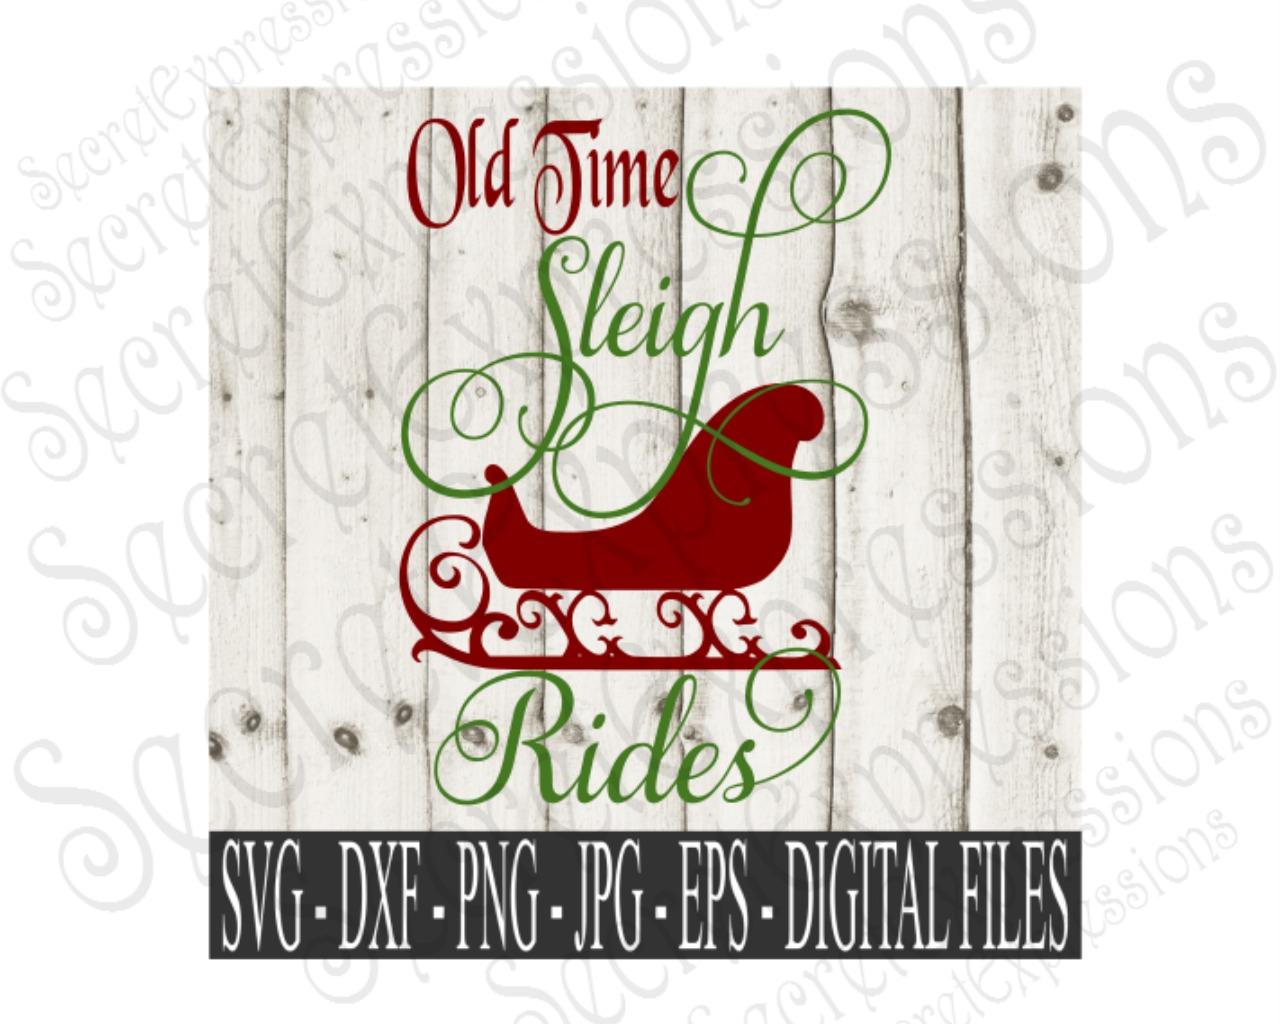 Old Time Sleigh Rides by SecretExpressi | Design Bundles